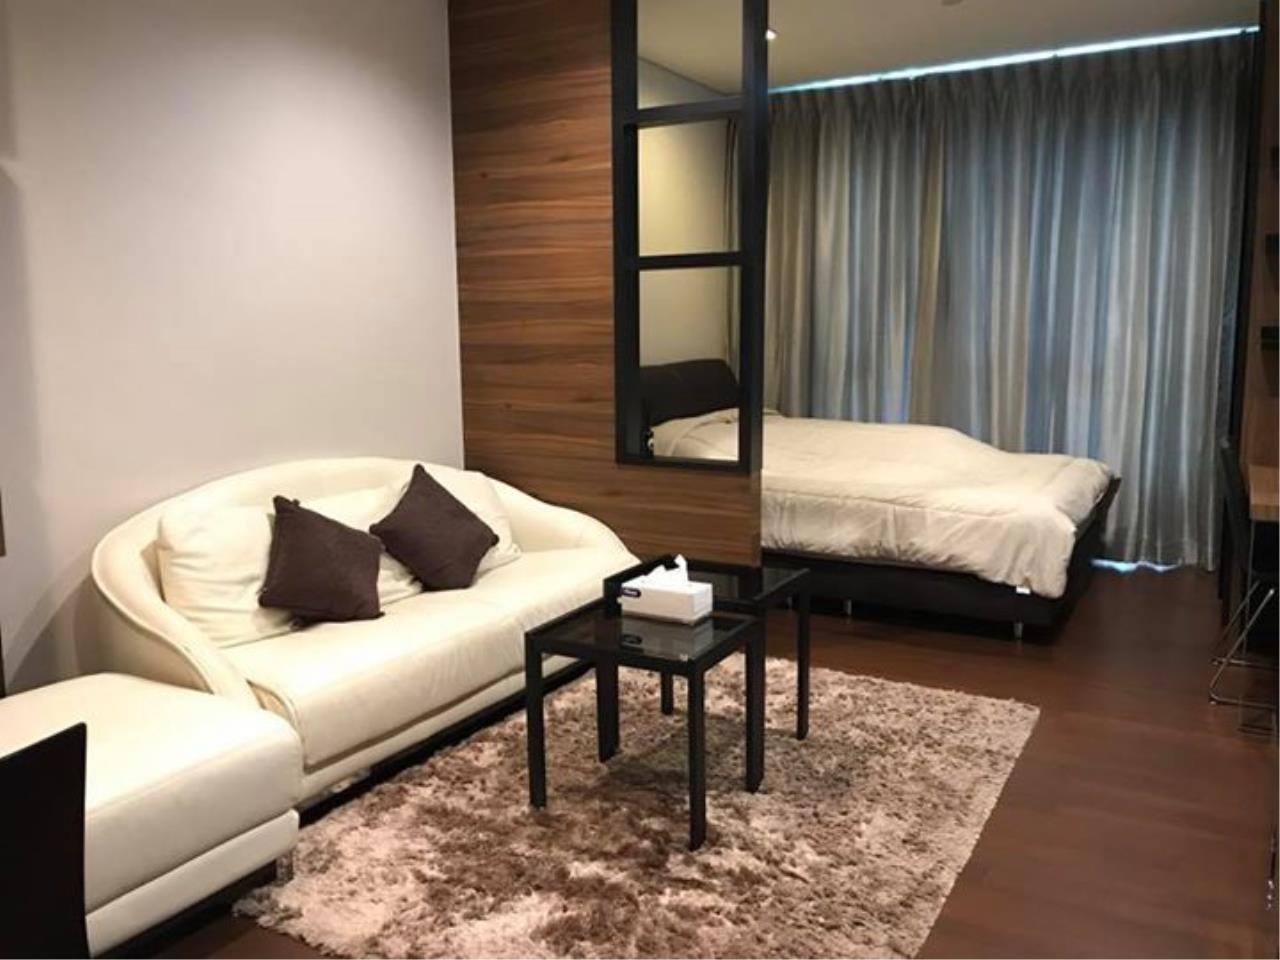 Quality Life Property Agency's S A L E & R E N T !! [ IVY THONGLOR ] Studio 35.63 Sq.m. New Decoration !! 1